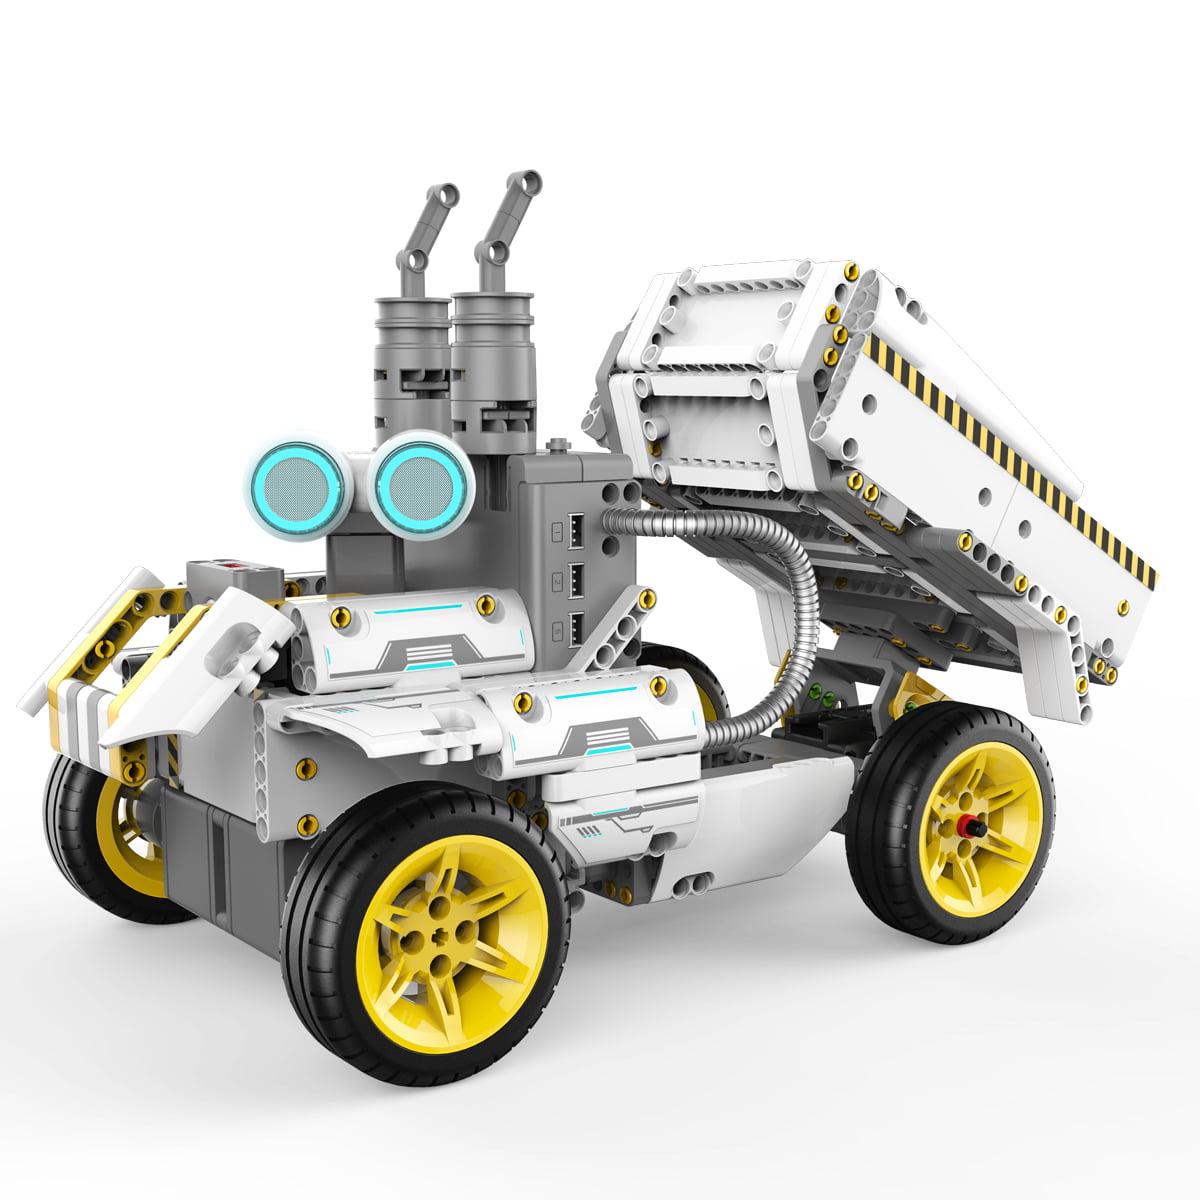 Jimu Robot BuilderBots Series: Overdrive Kit